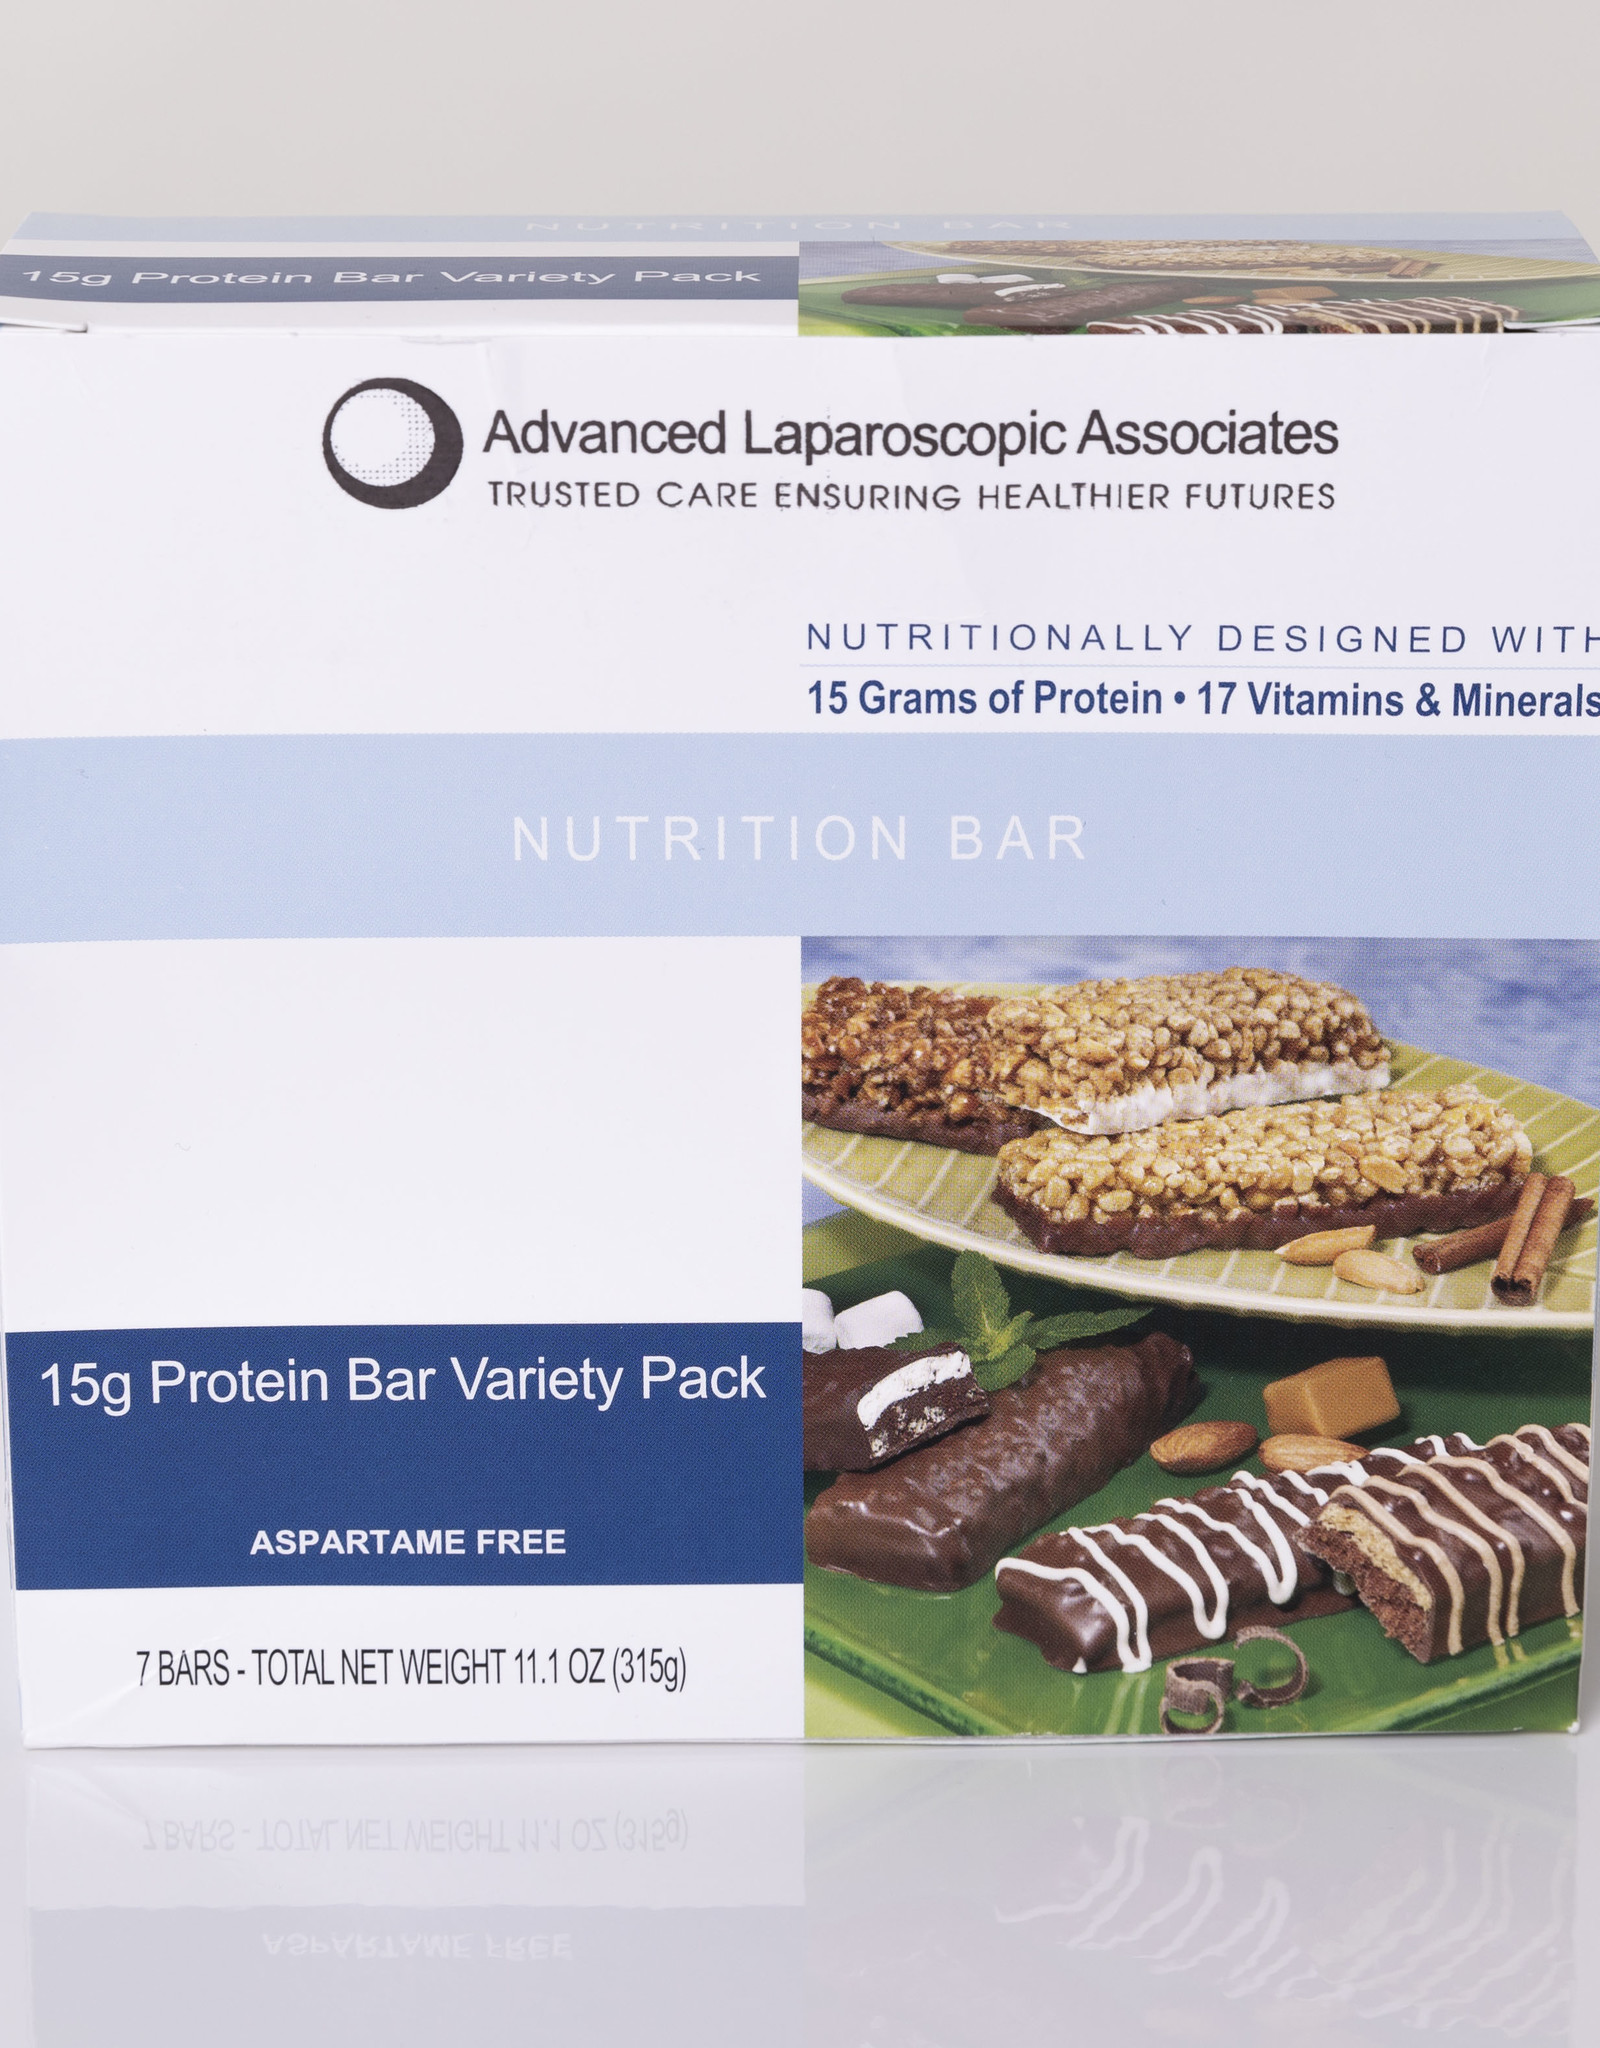 Advanced Laparoscopic Associates 15G Bar Variety Pack